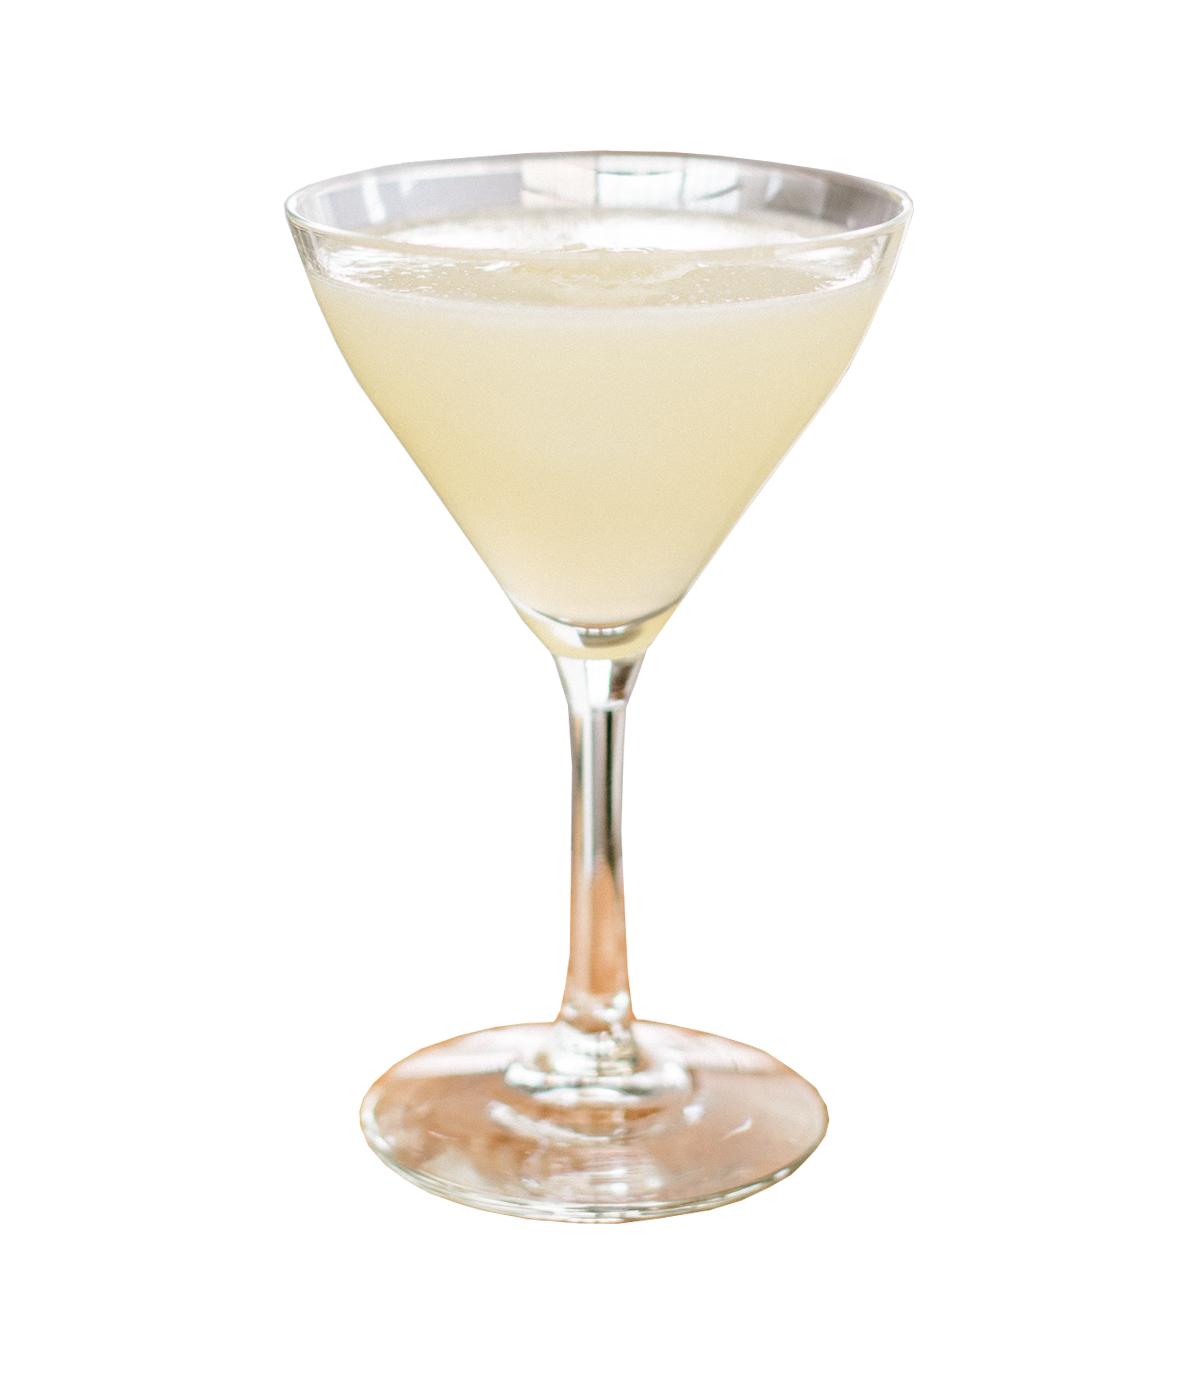 XYZ  4ml Rich Simple Syrup* 25ml Norseman Orange Liqueur 25ml Fresh Lemon Juice 50ml Norseman Rum  Shake and strain into glass. Float an ice cube on top.